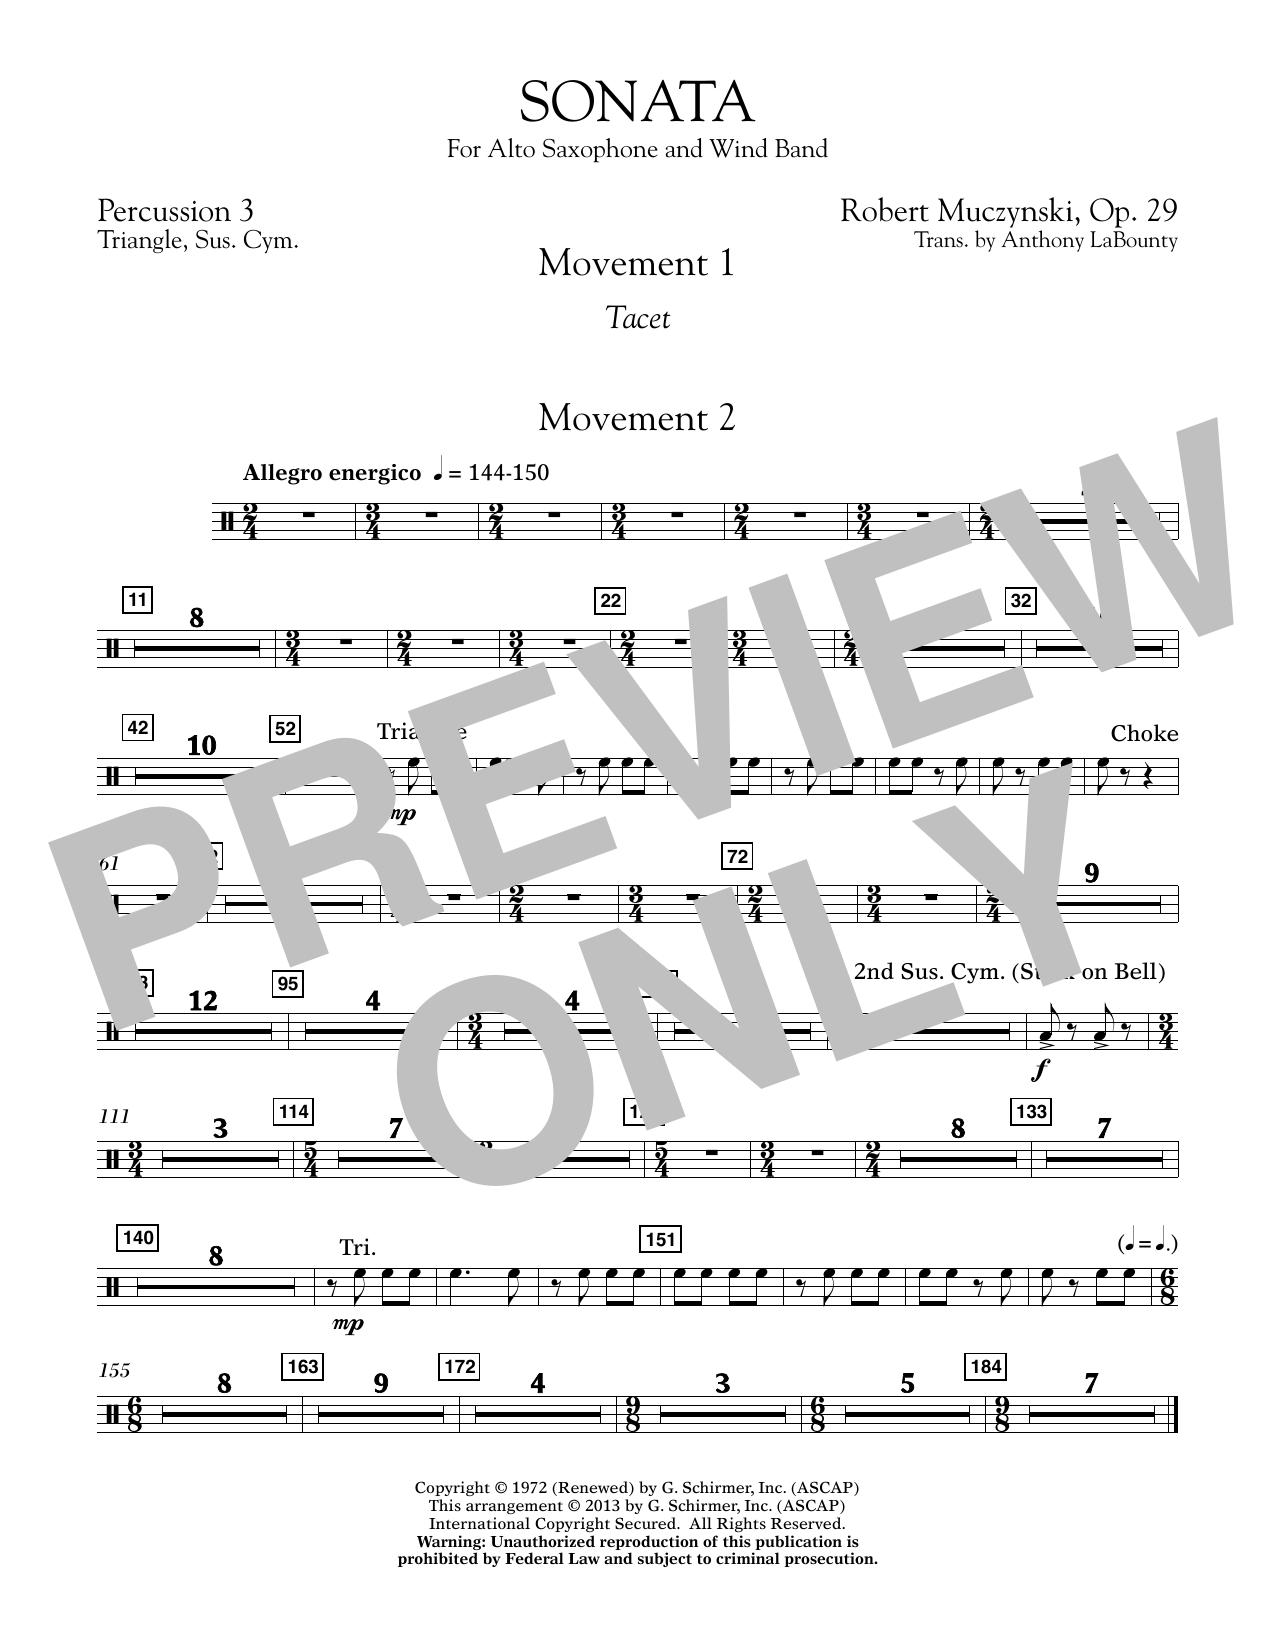 Sonata for Alto Saxophone, Op. 29 - Percussion 3 (Concert Band)